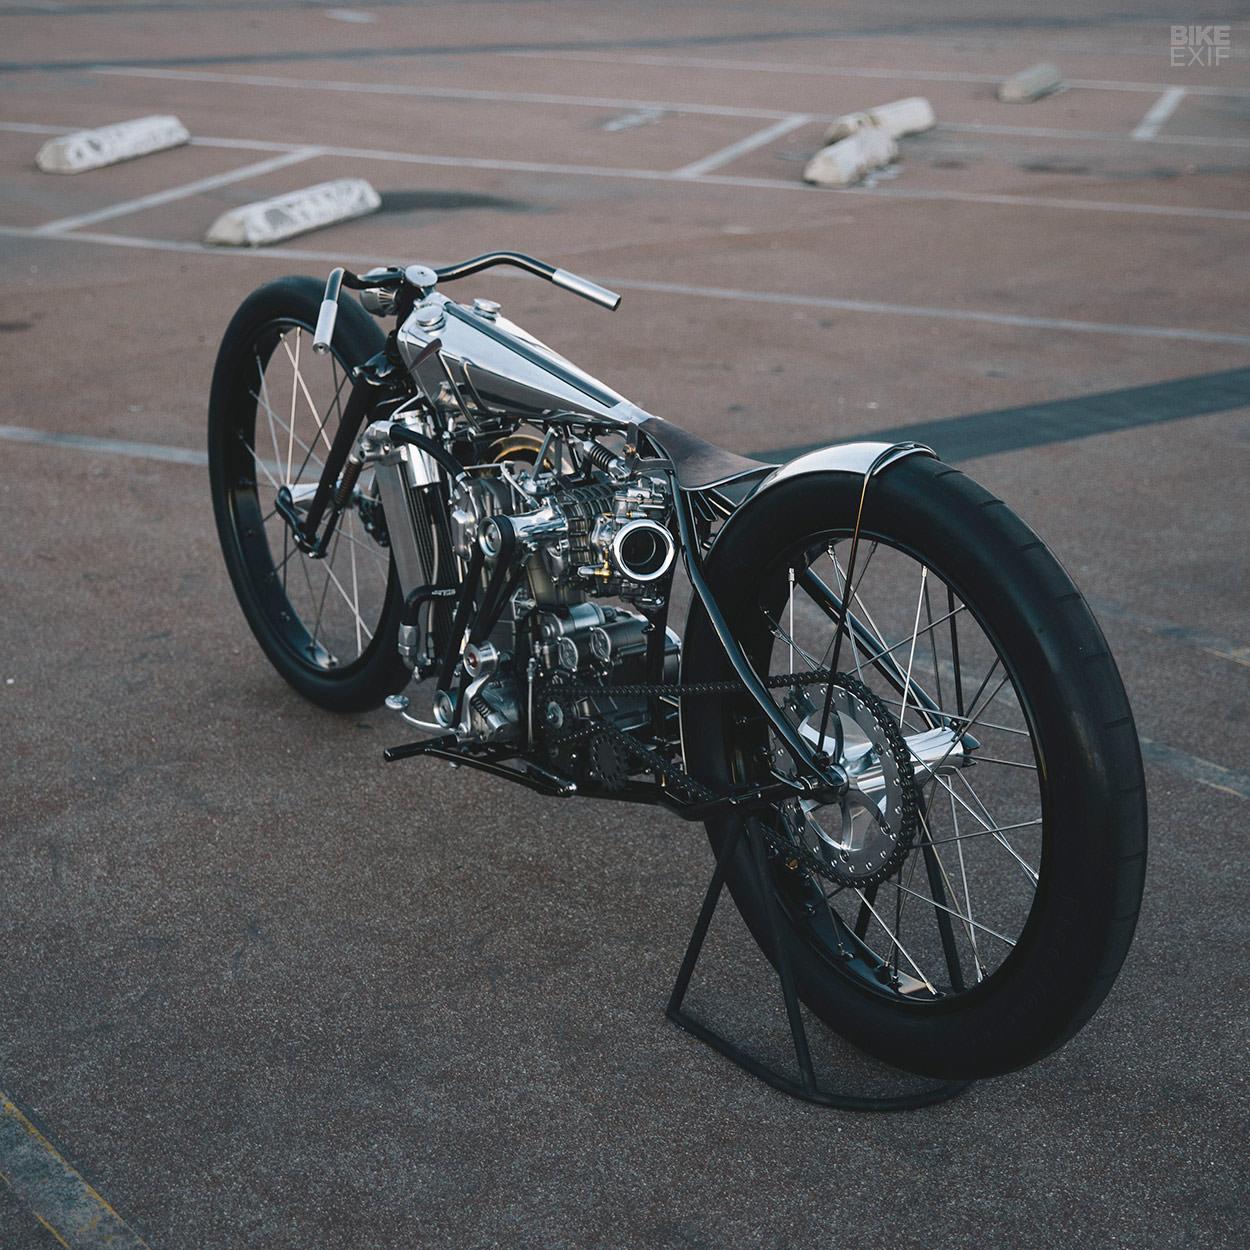 Max_Hazan_Supercharged_KTM_520_Custom_Moto-Mucci (7).jpg